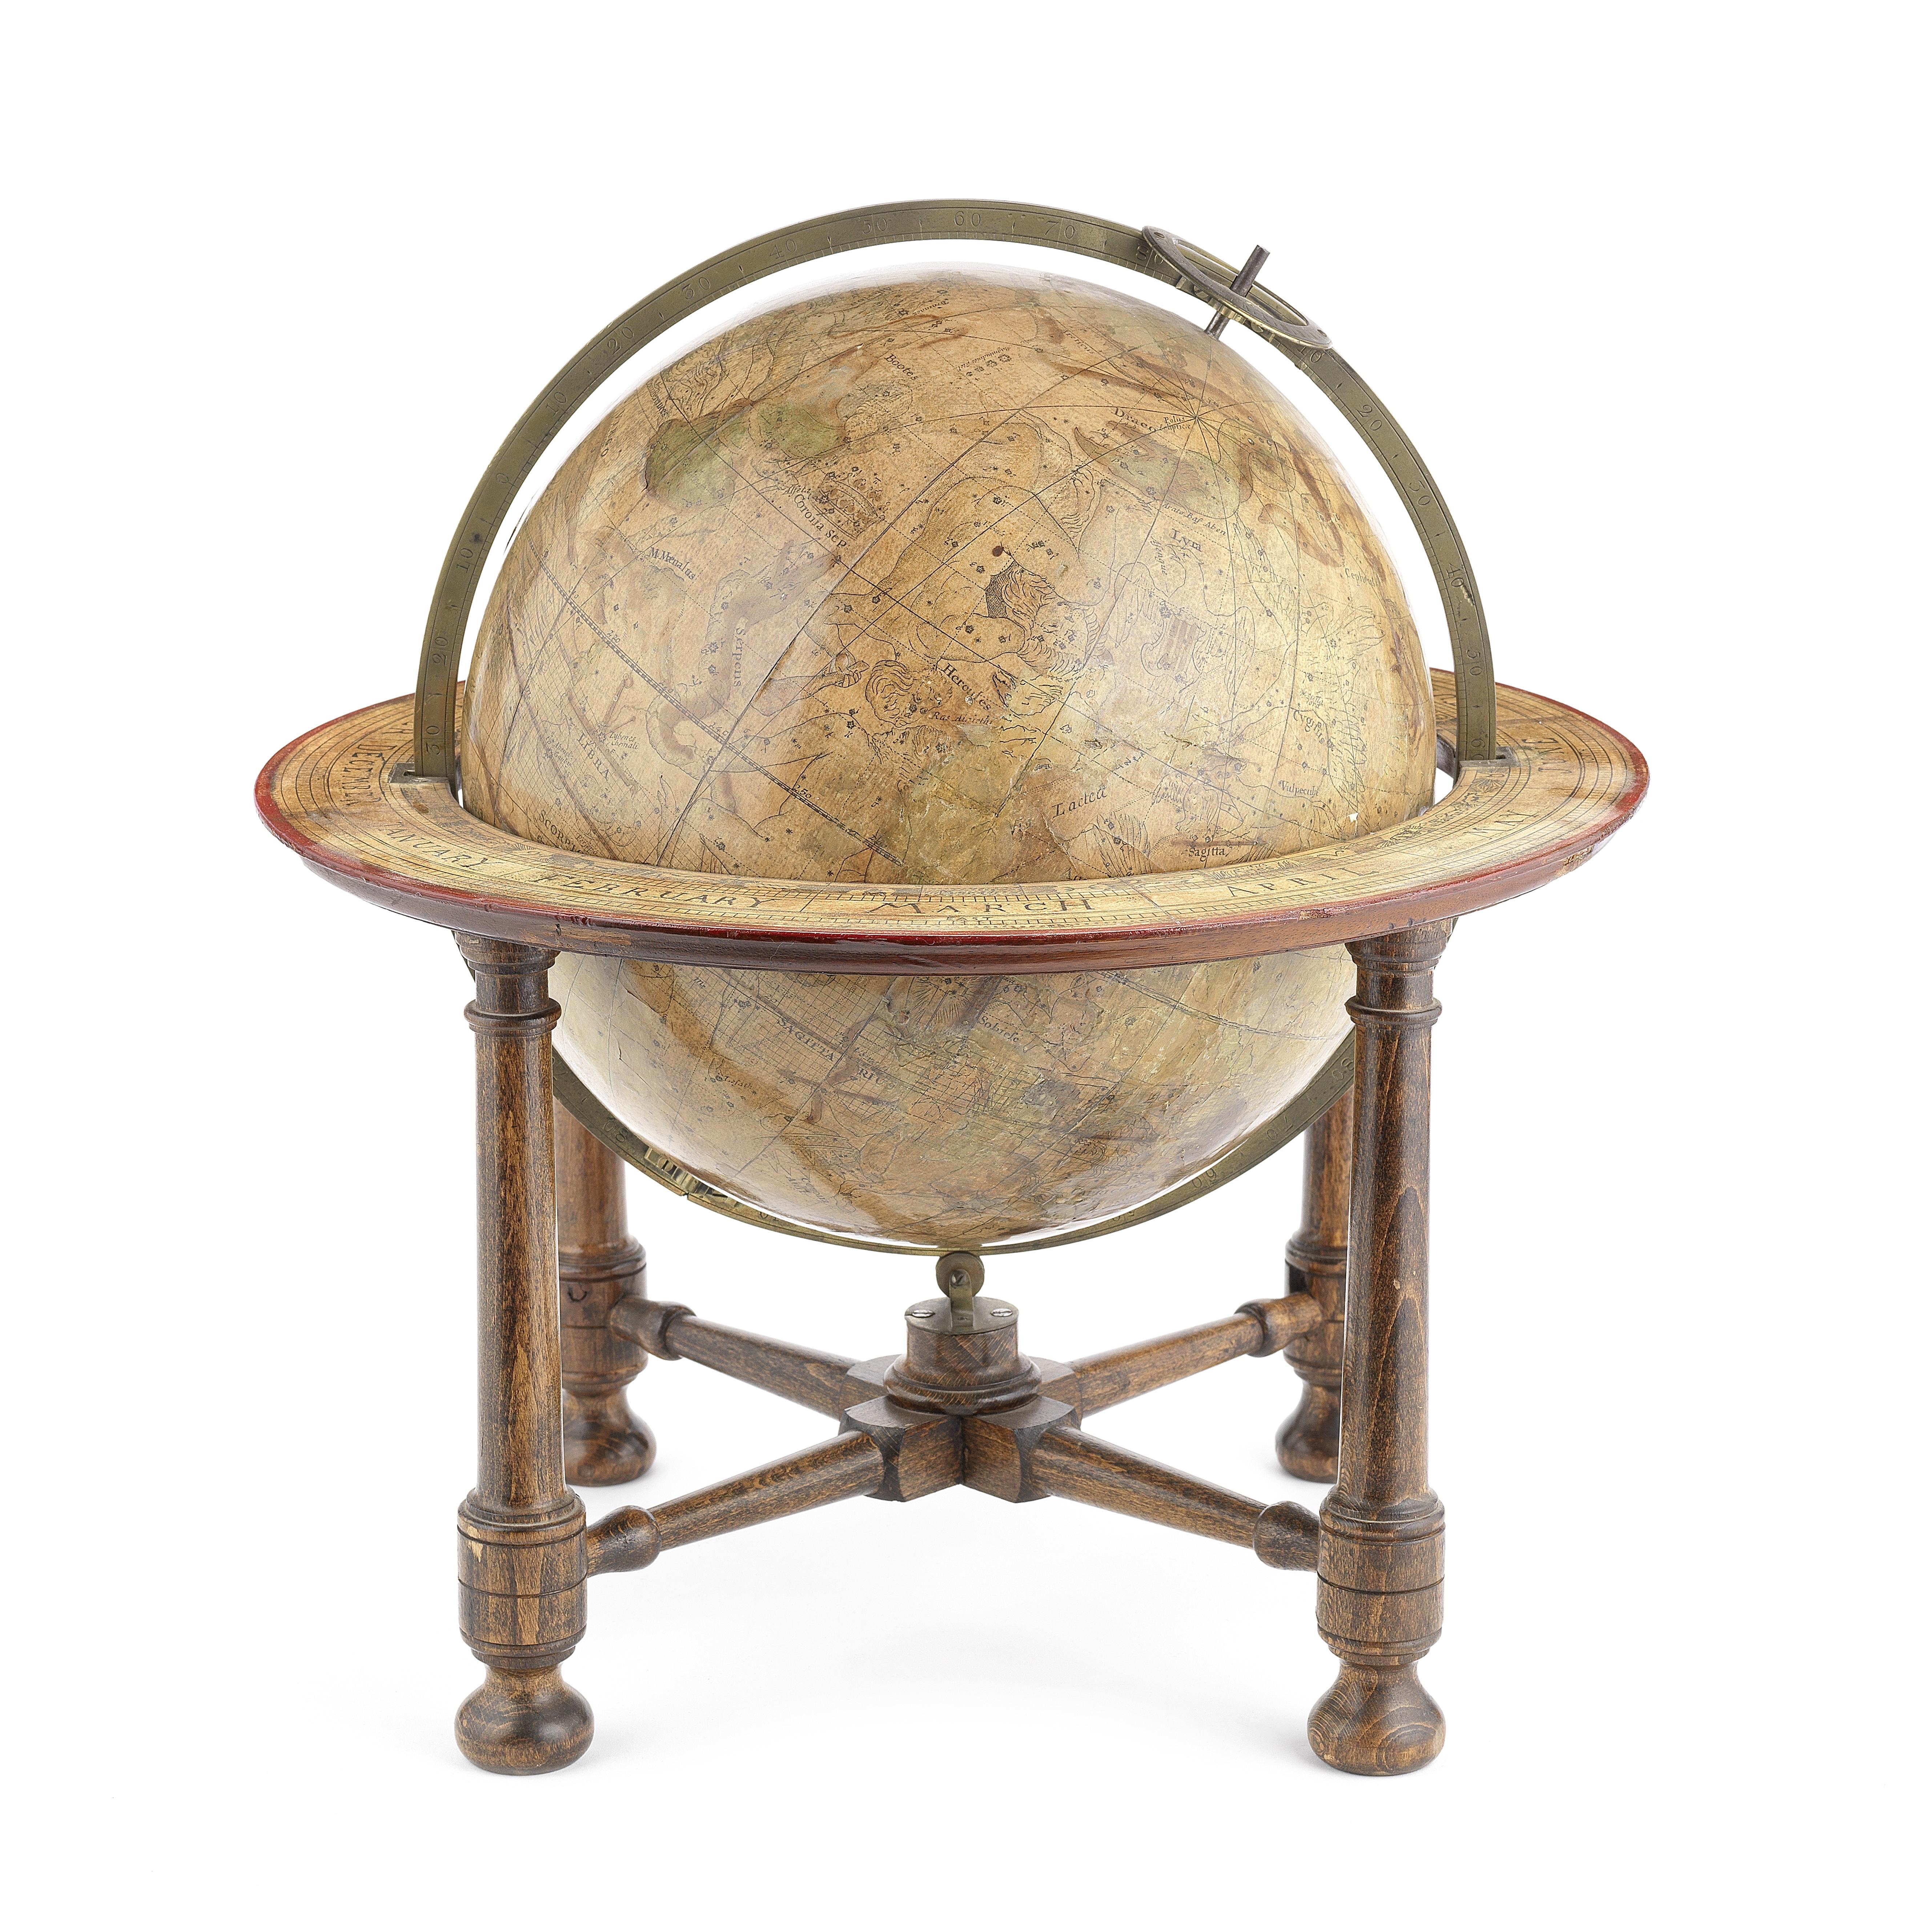 A Benjamin Martin/John Senex 12-inch celestial table globe, English, third quarter of the 18th ce...